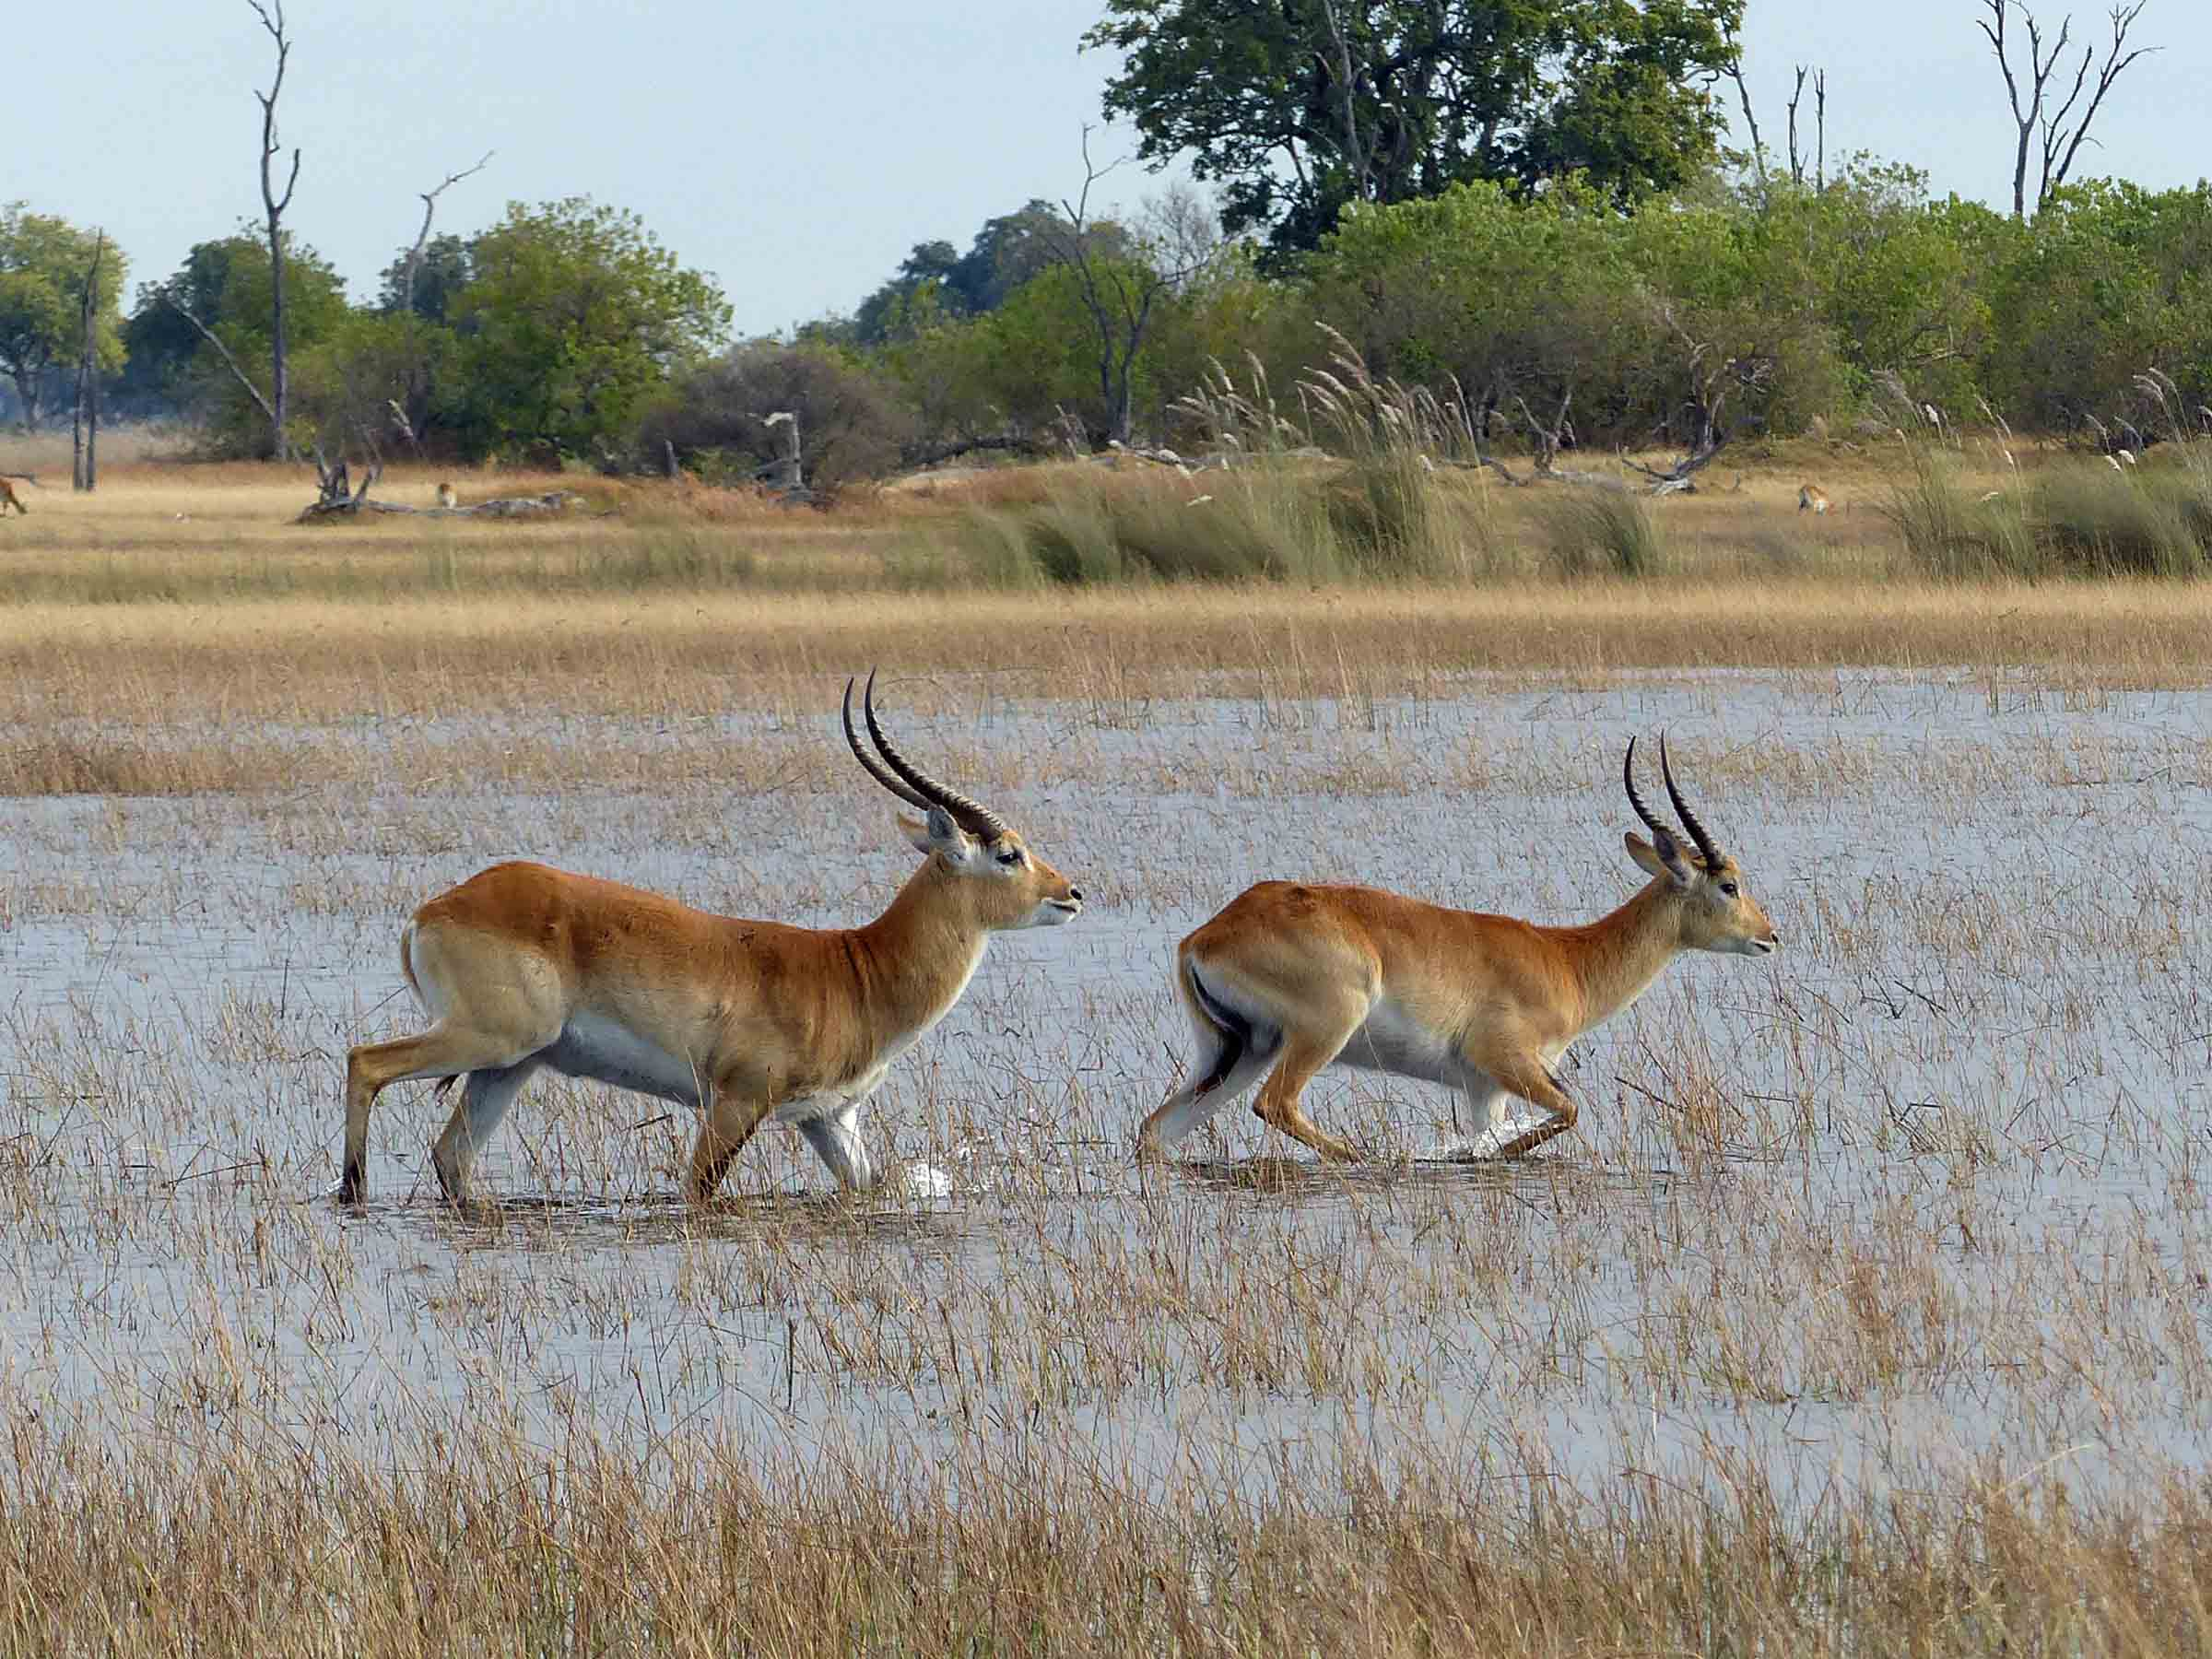 Two deer running through shallow water